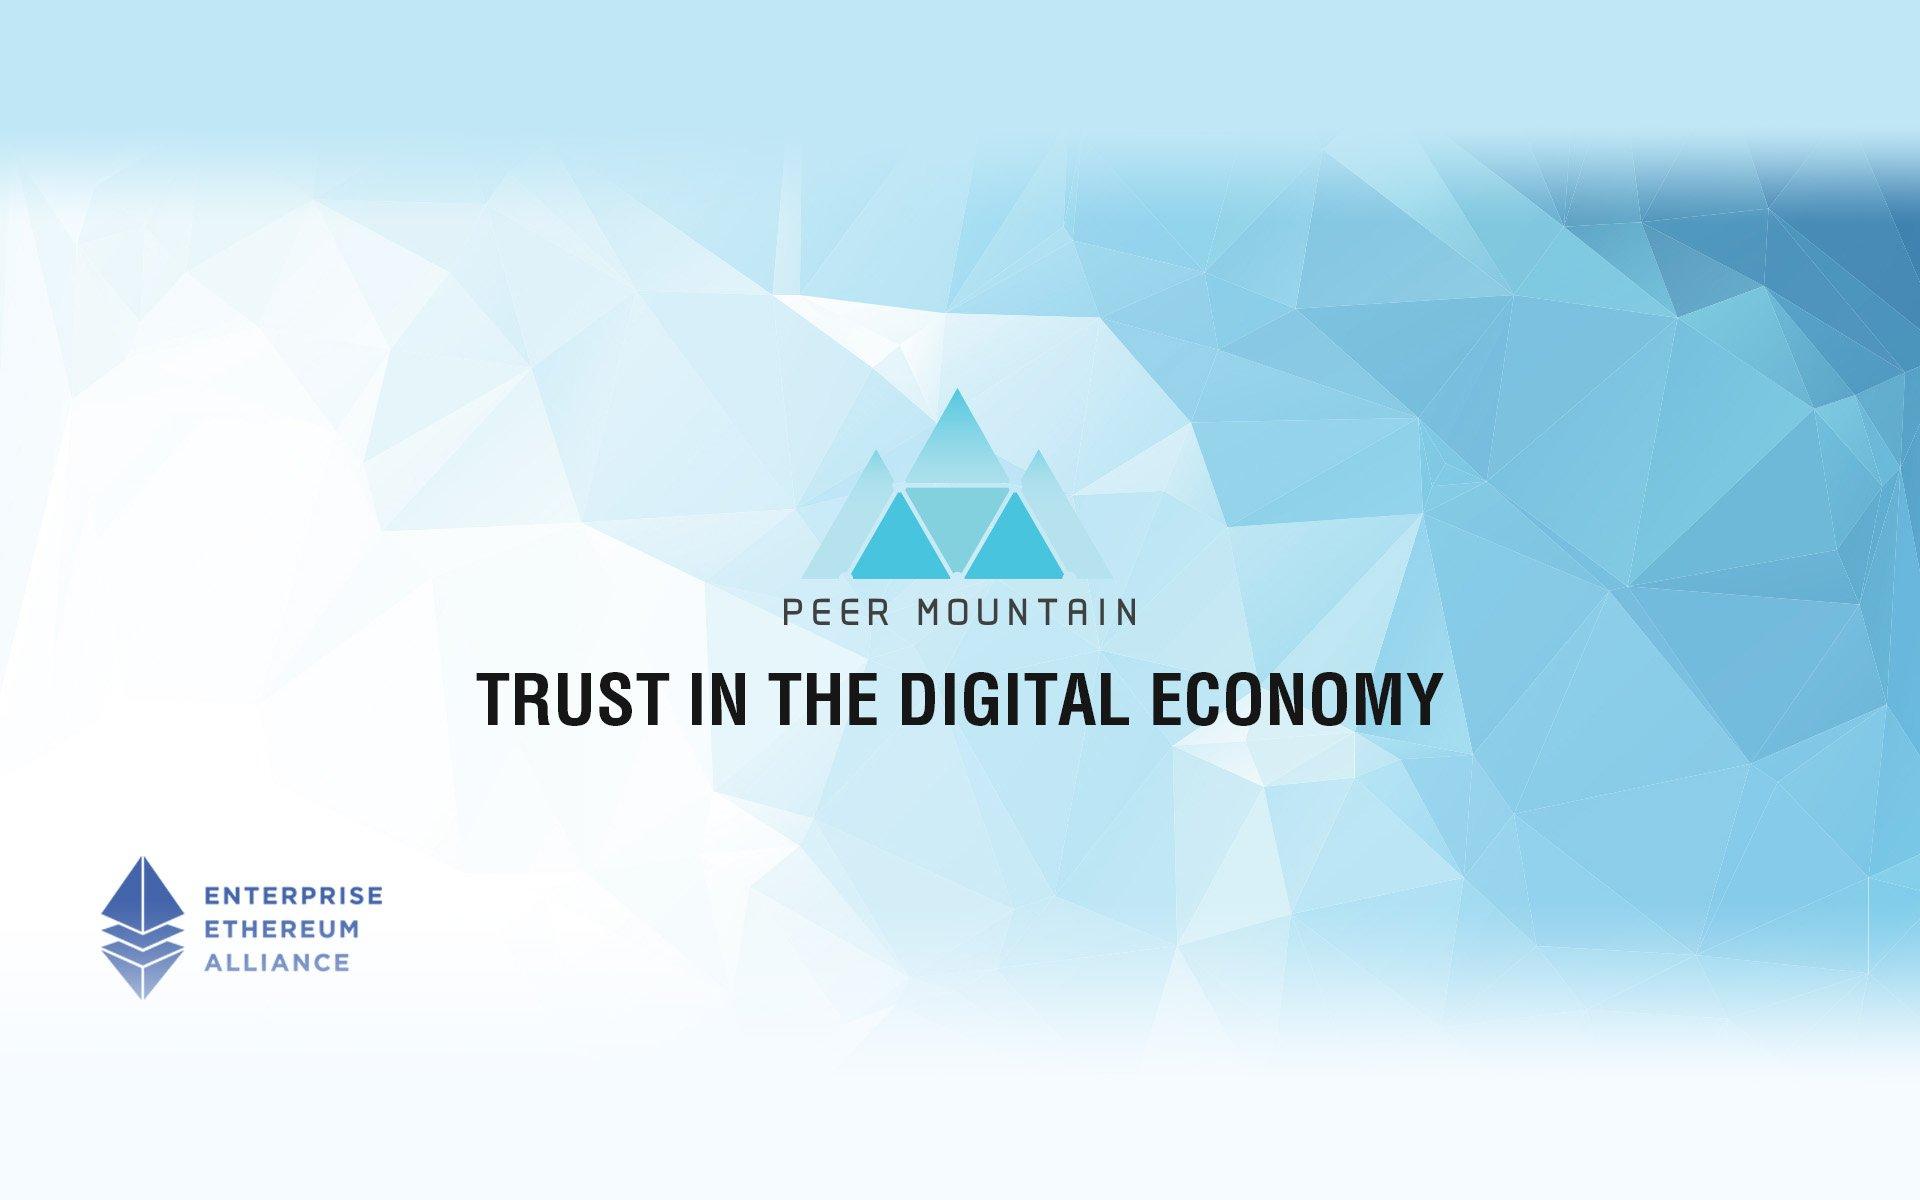 Peer Mountain Joins the Largest Open-Source Blockchain Initiative, Enterprise Ethereum Alliance